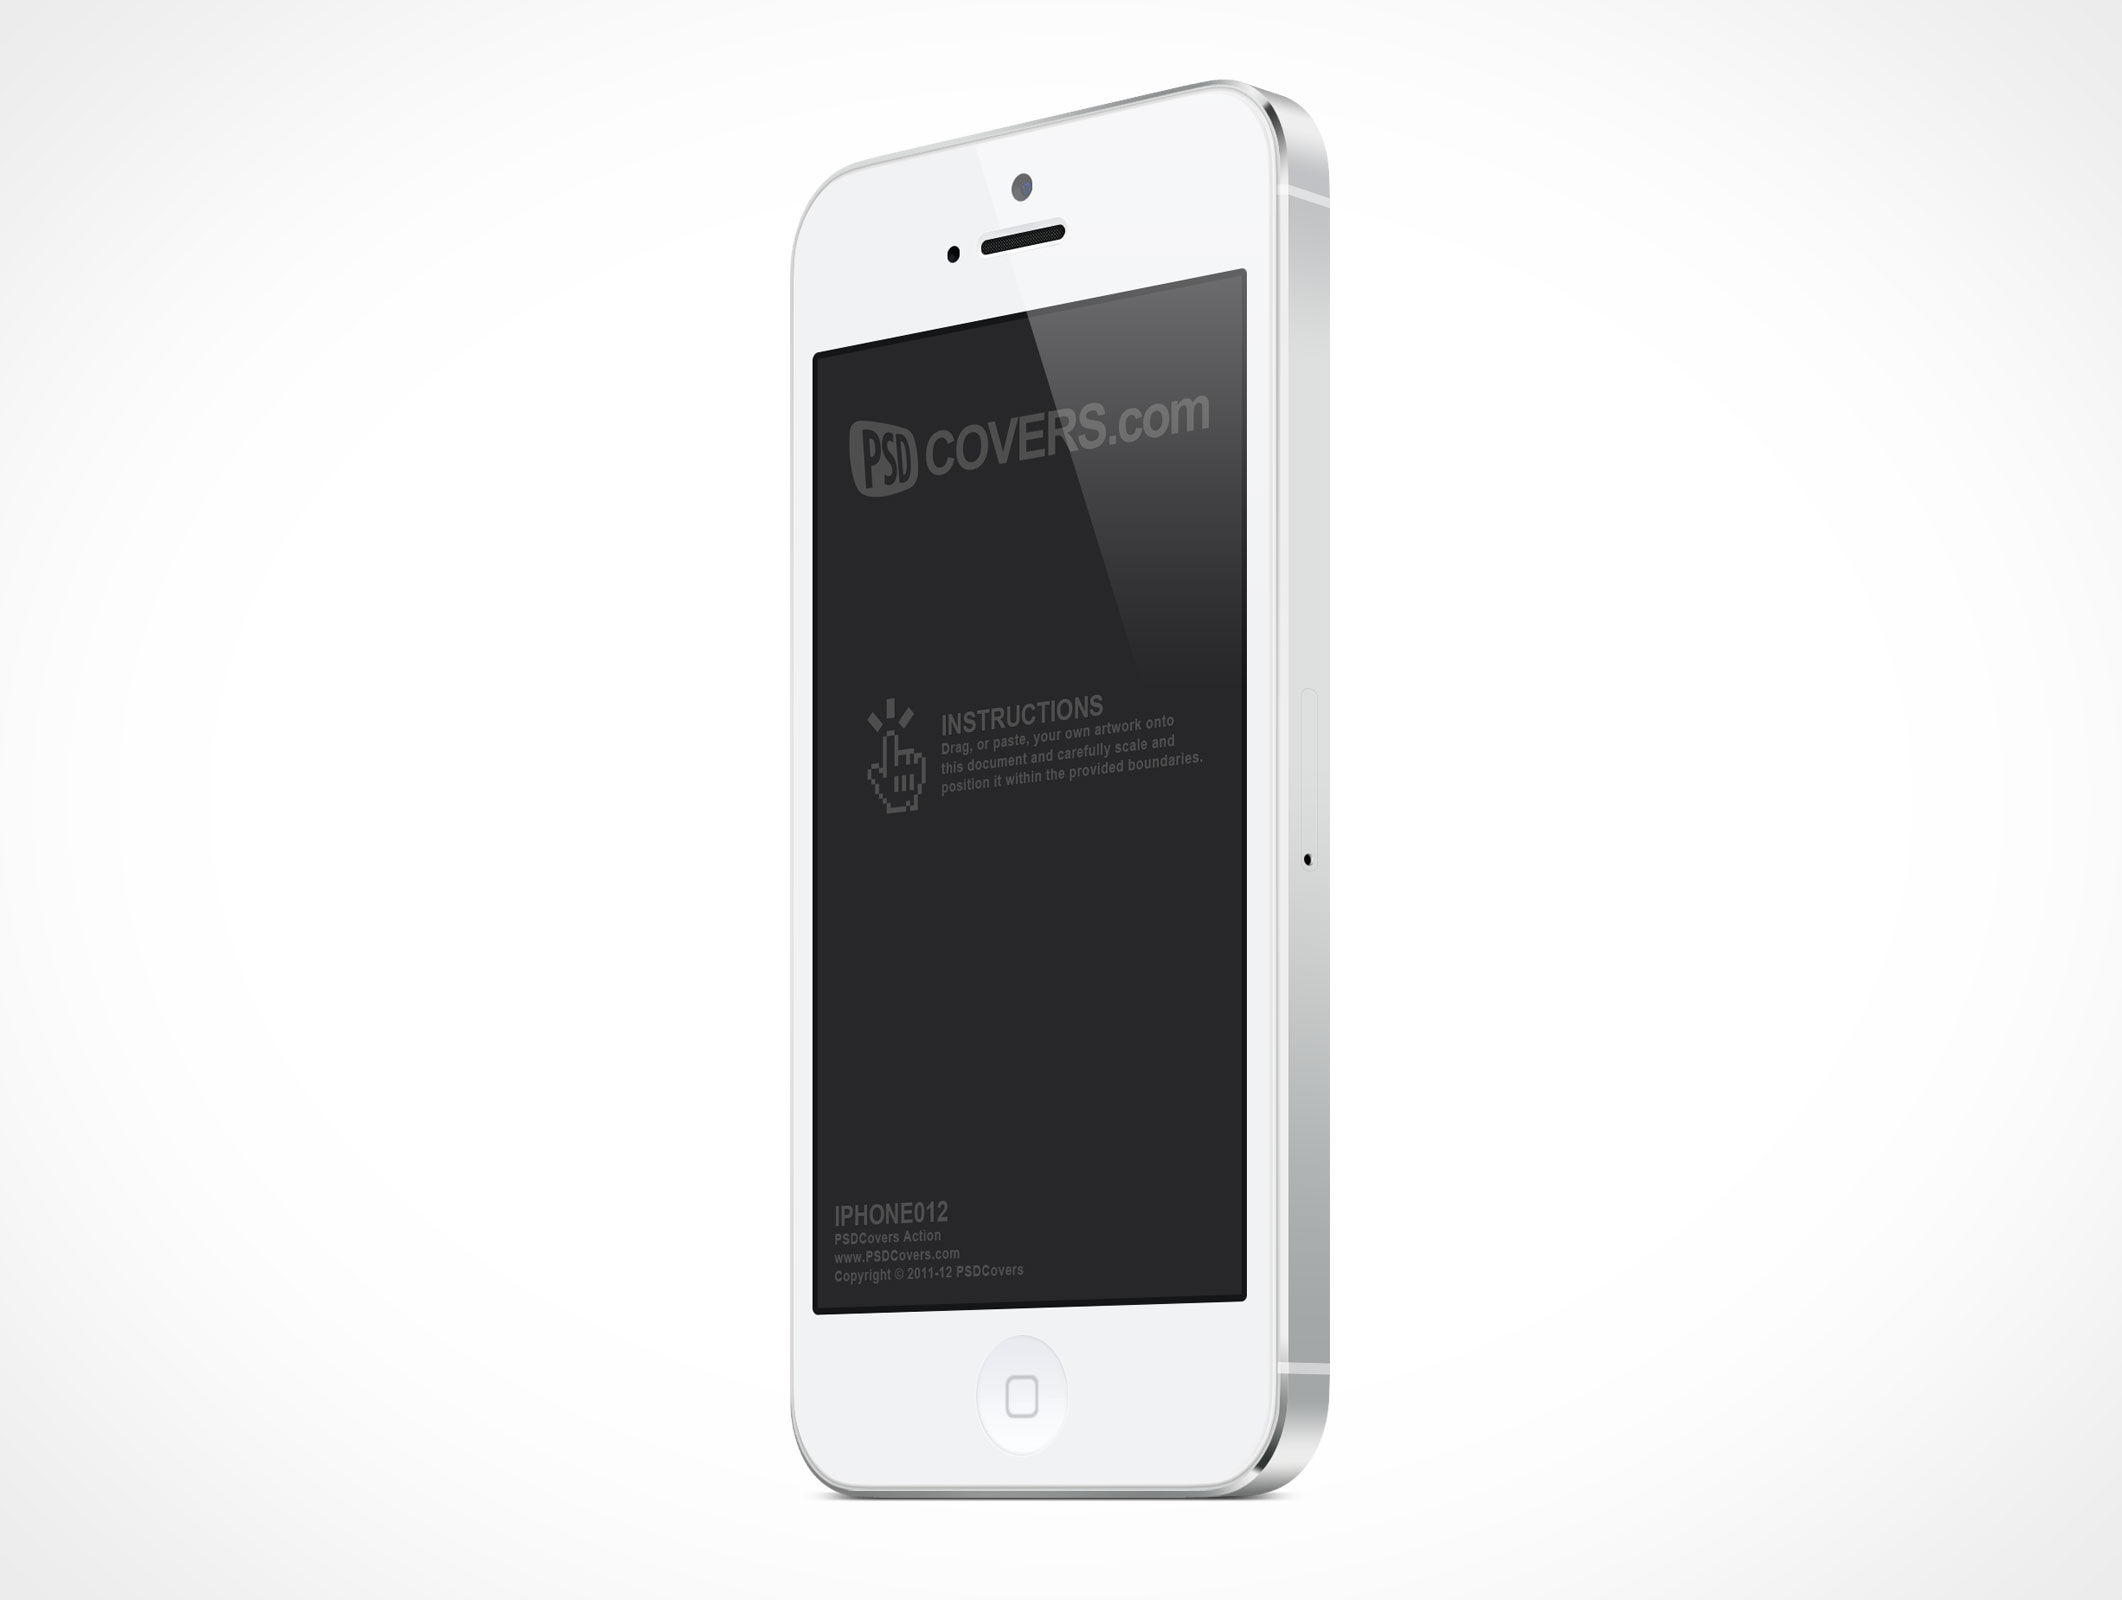 IPHONE012